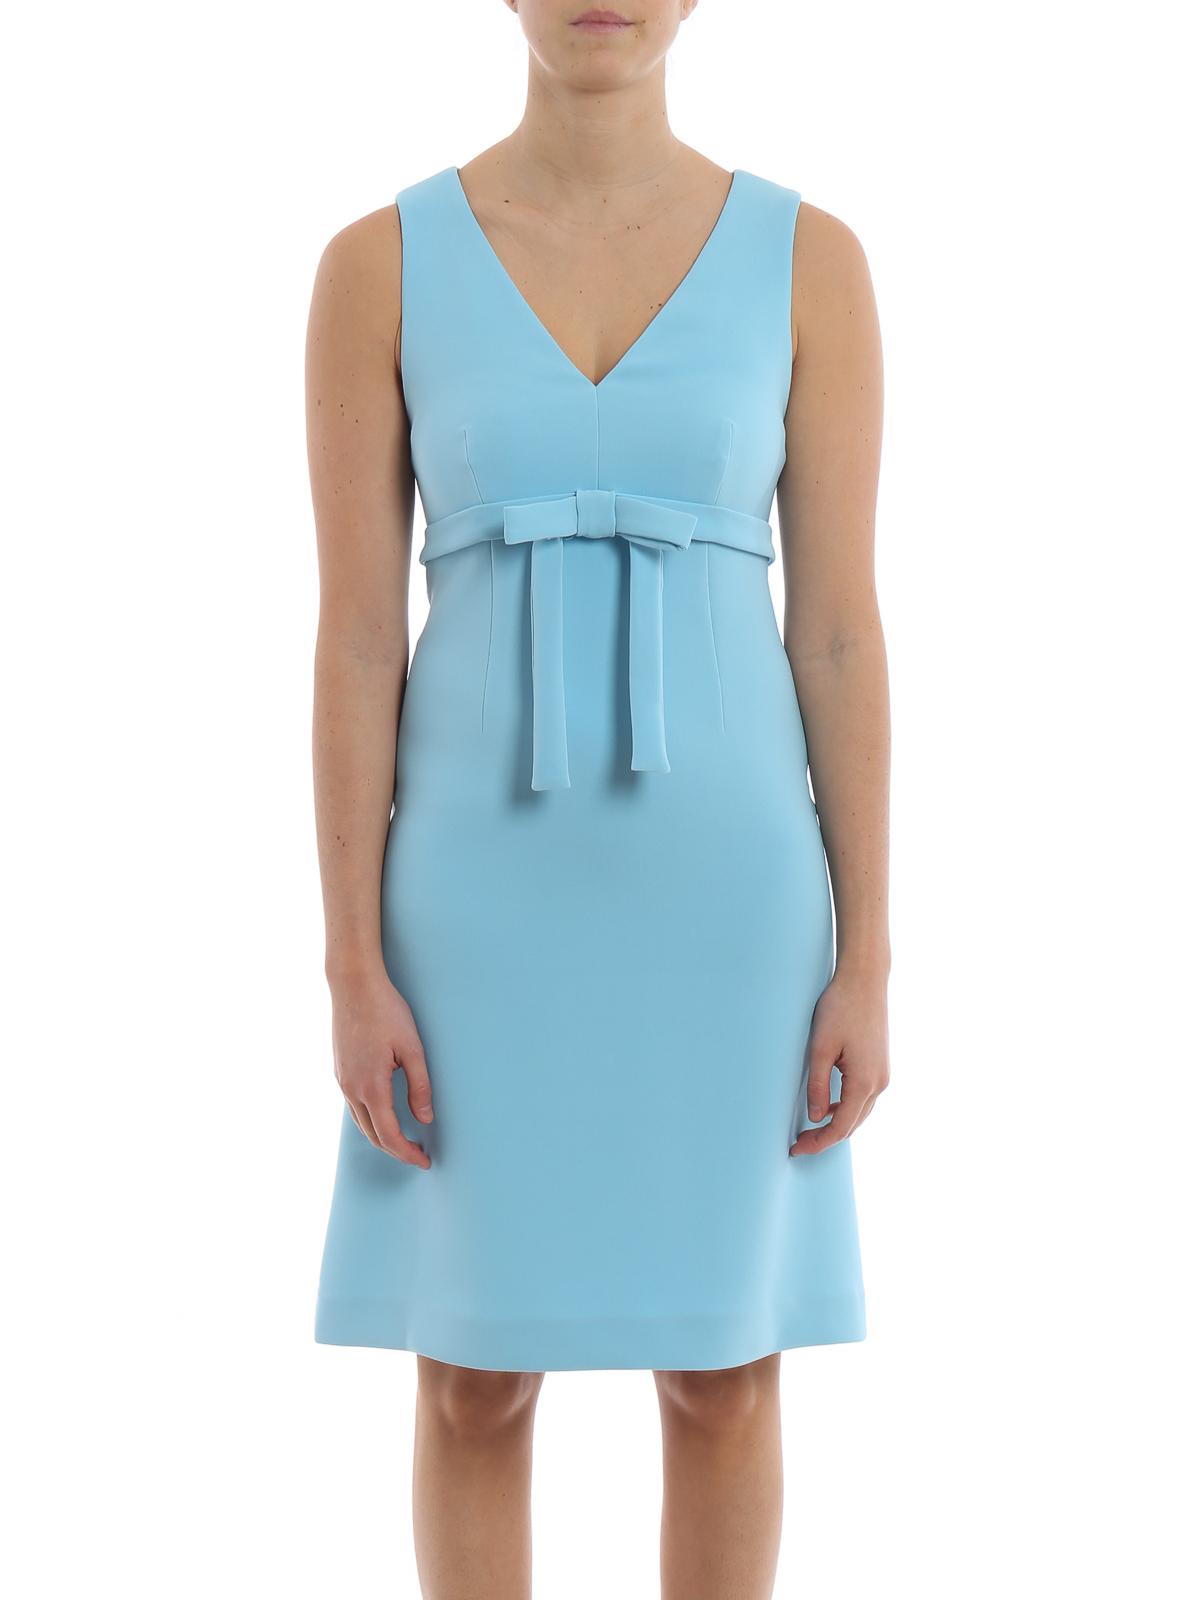 P.A.R.O.S.H. - Knielanges Kleid - Hellblau - Knielange Kleider